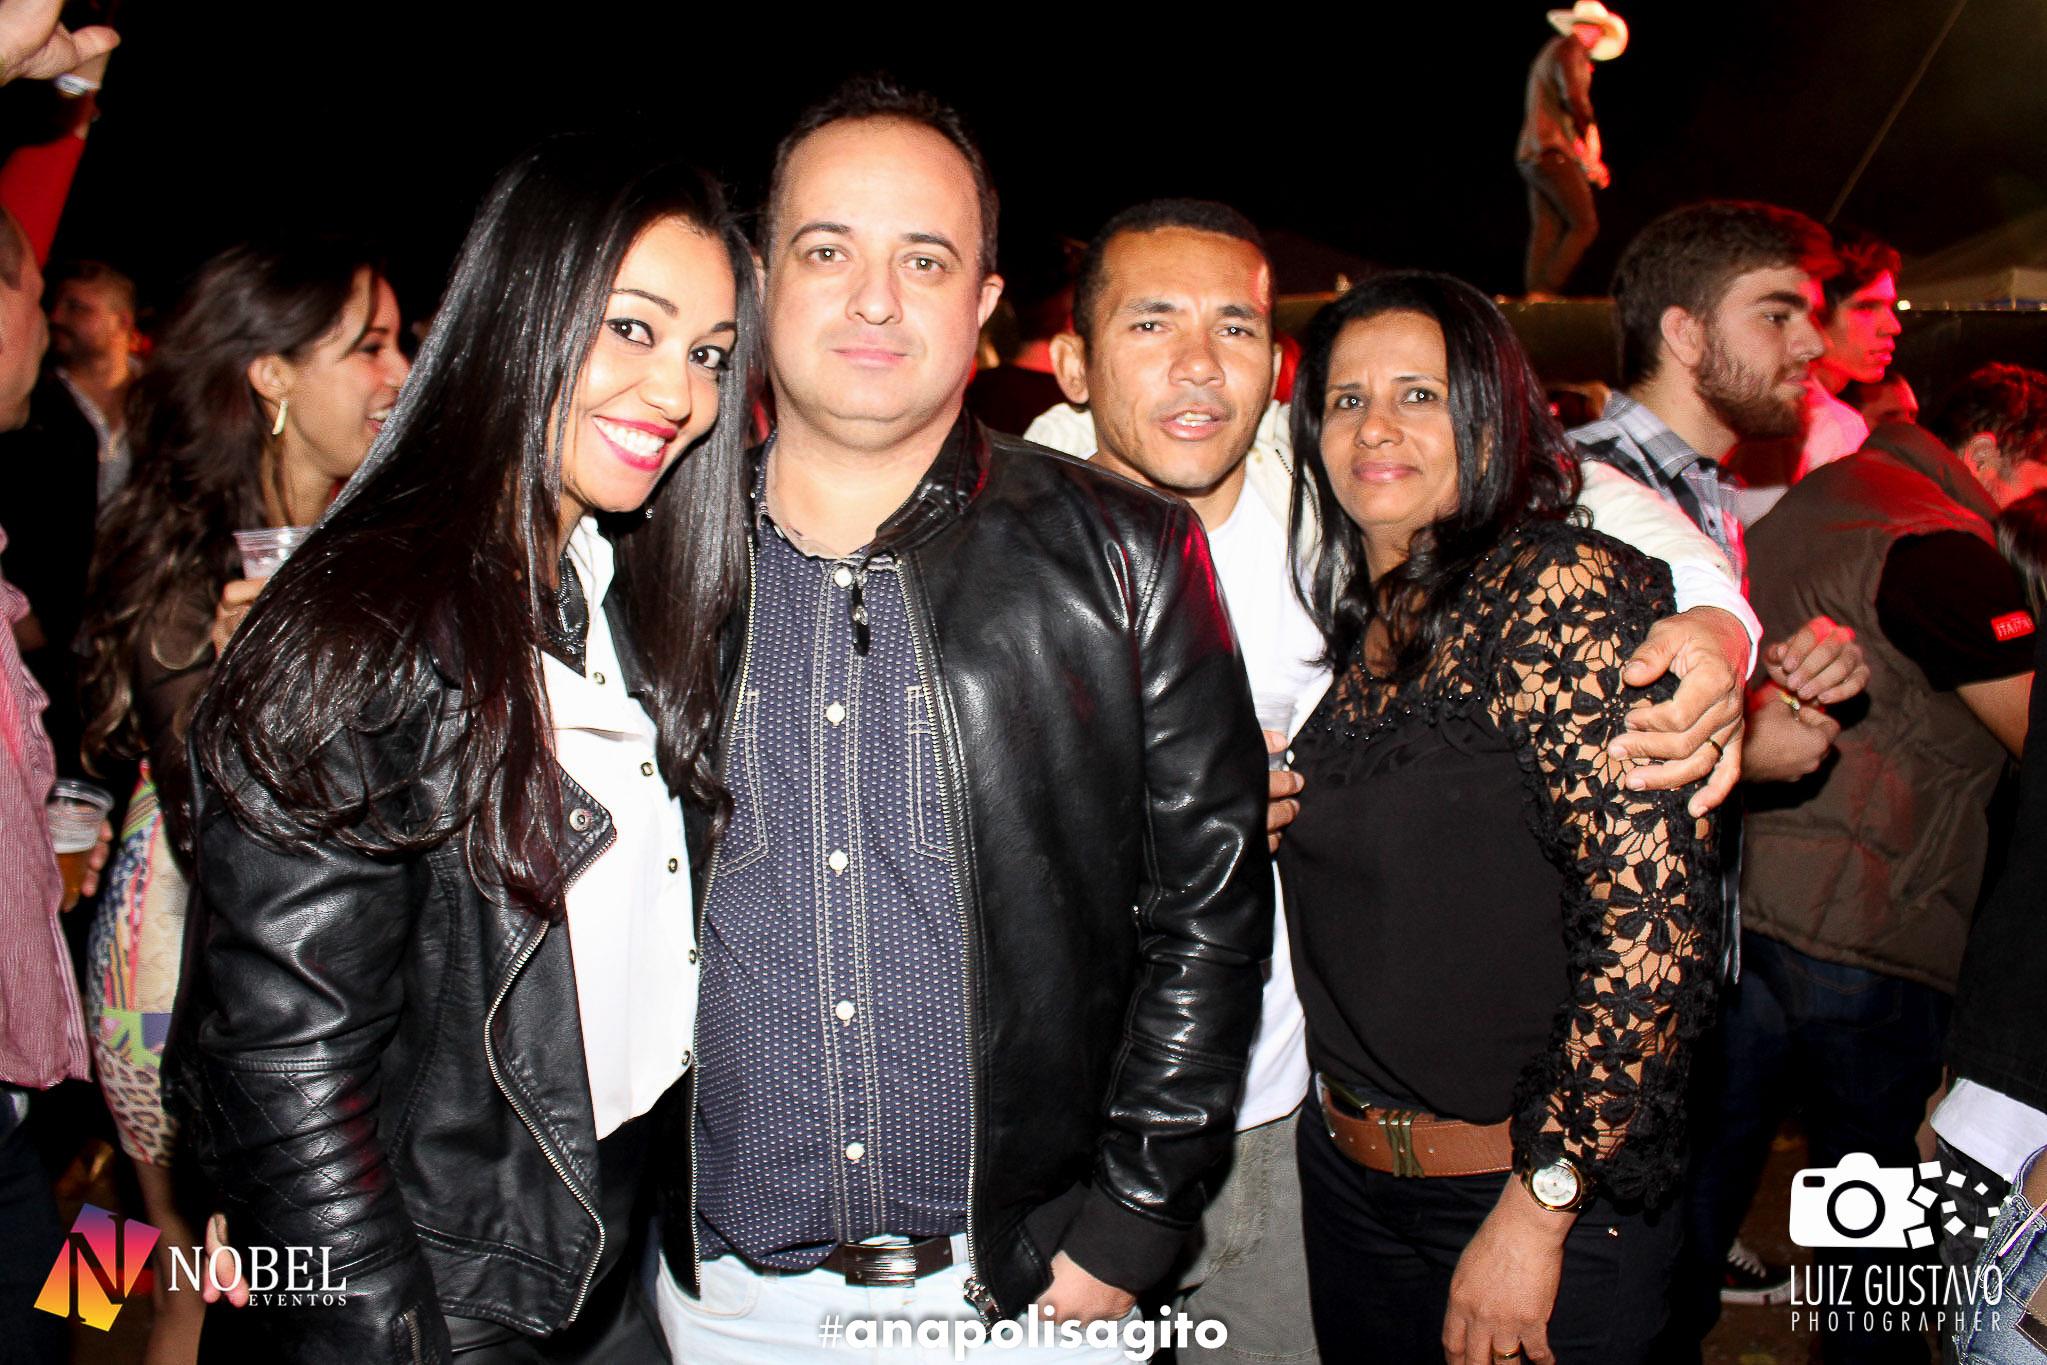 Luiz Gustavo Photographer-98